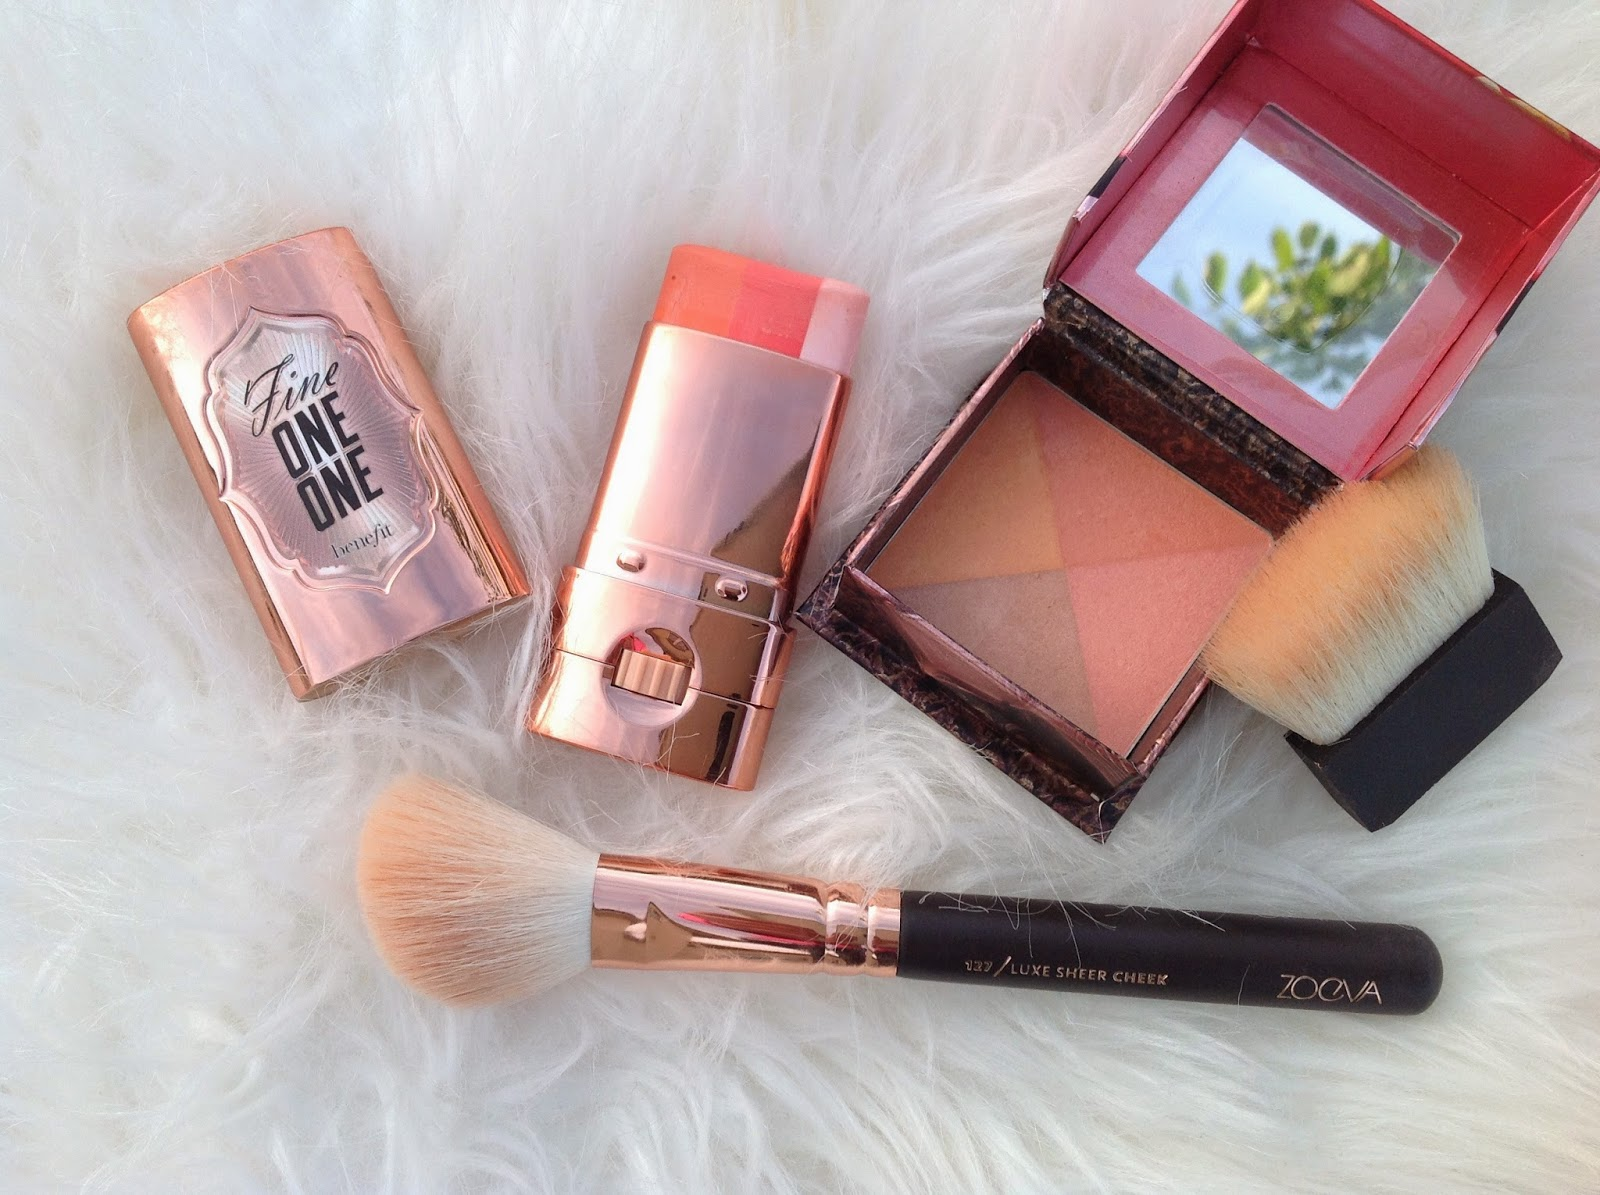 Benefit, Highlighter, Blusher, Review, Makeup, Beauty